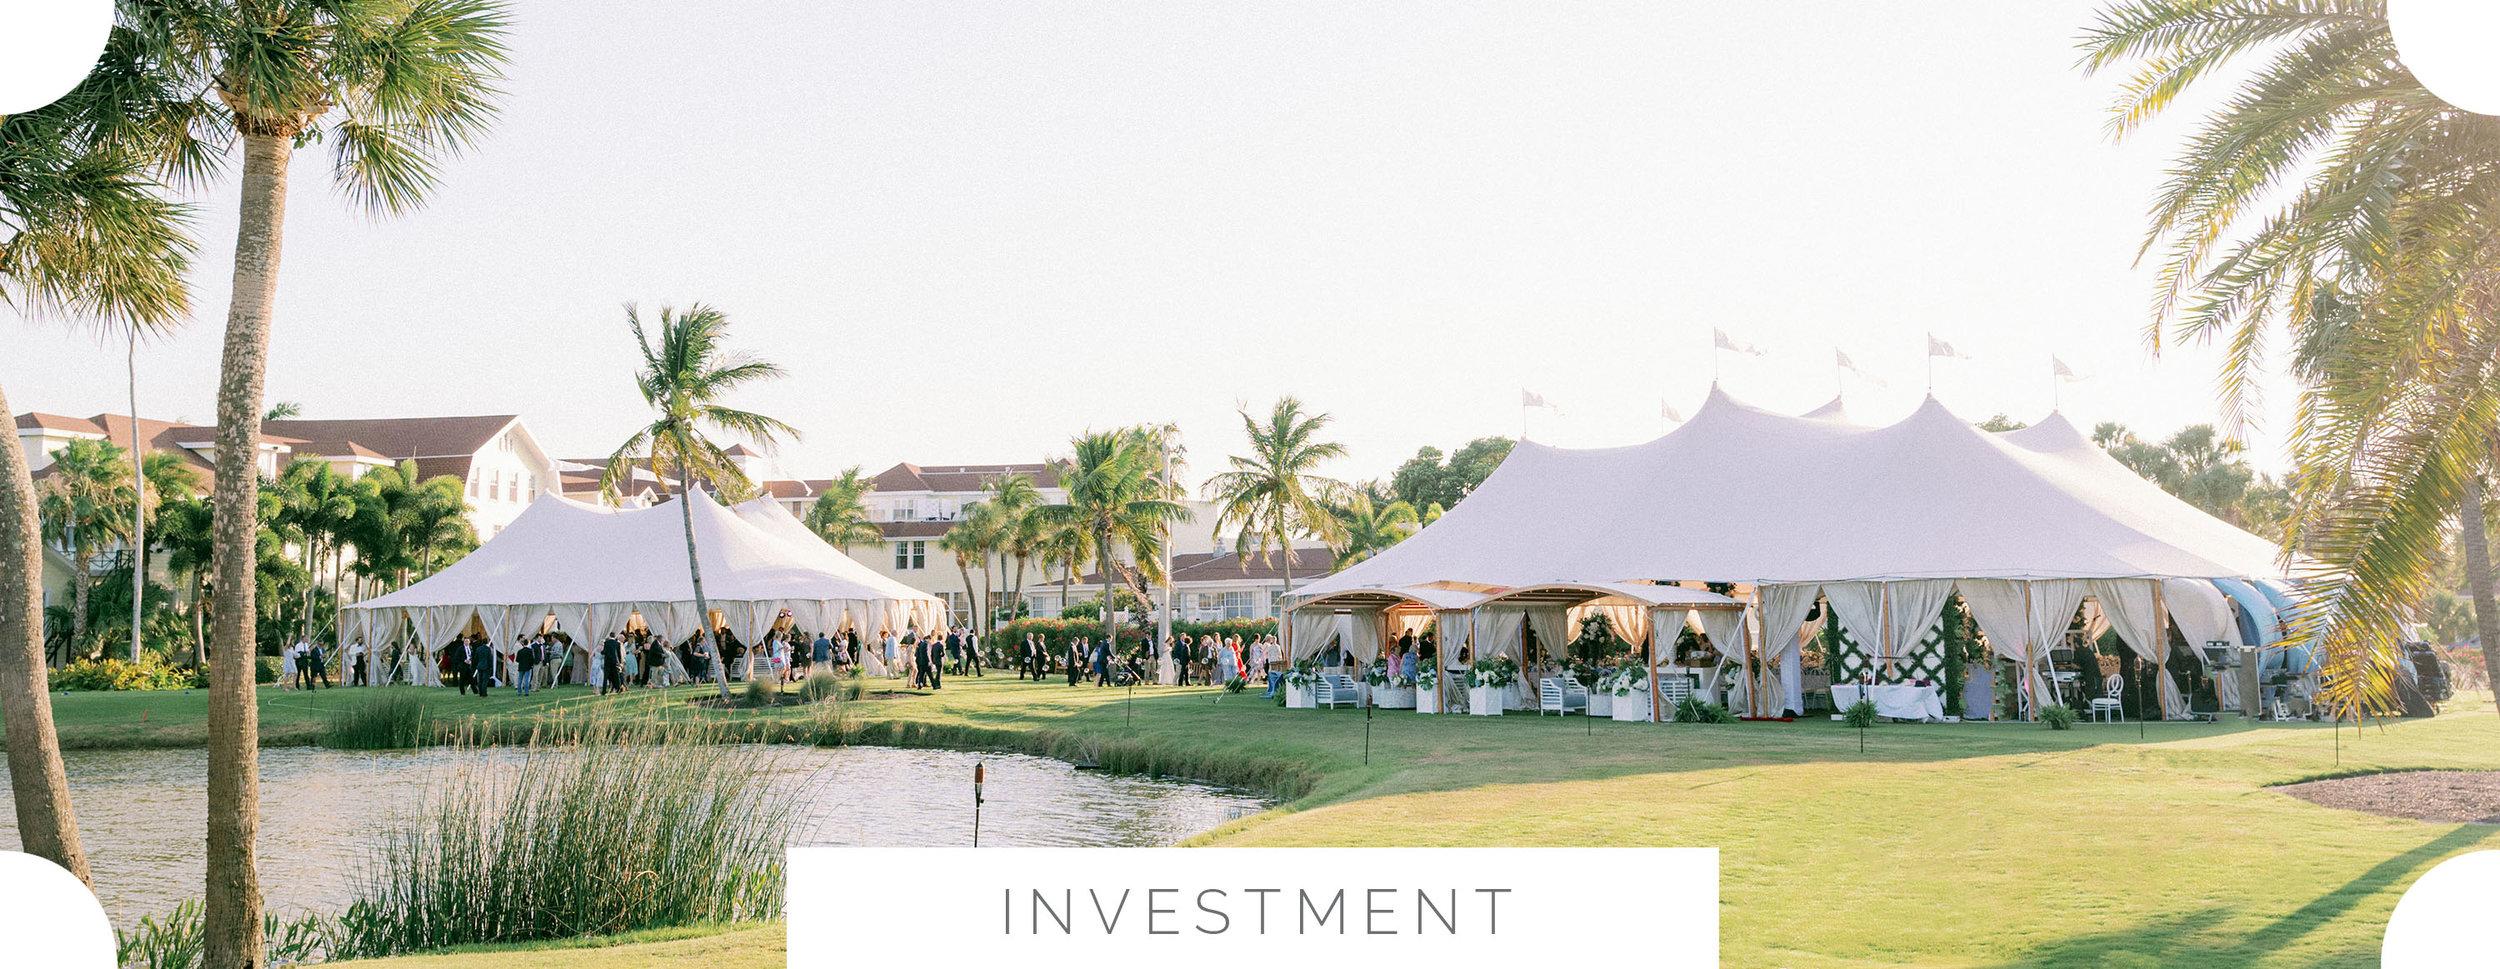 investment-photo.jpg